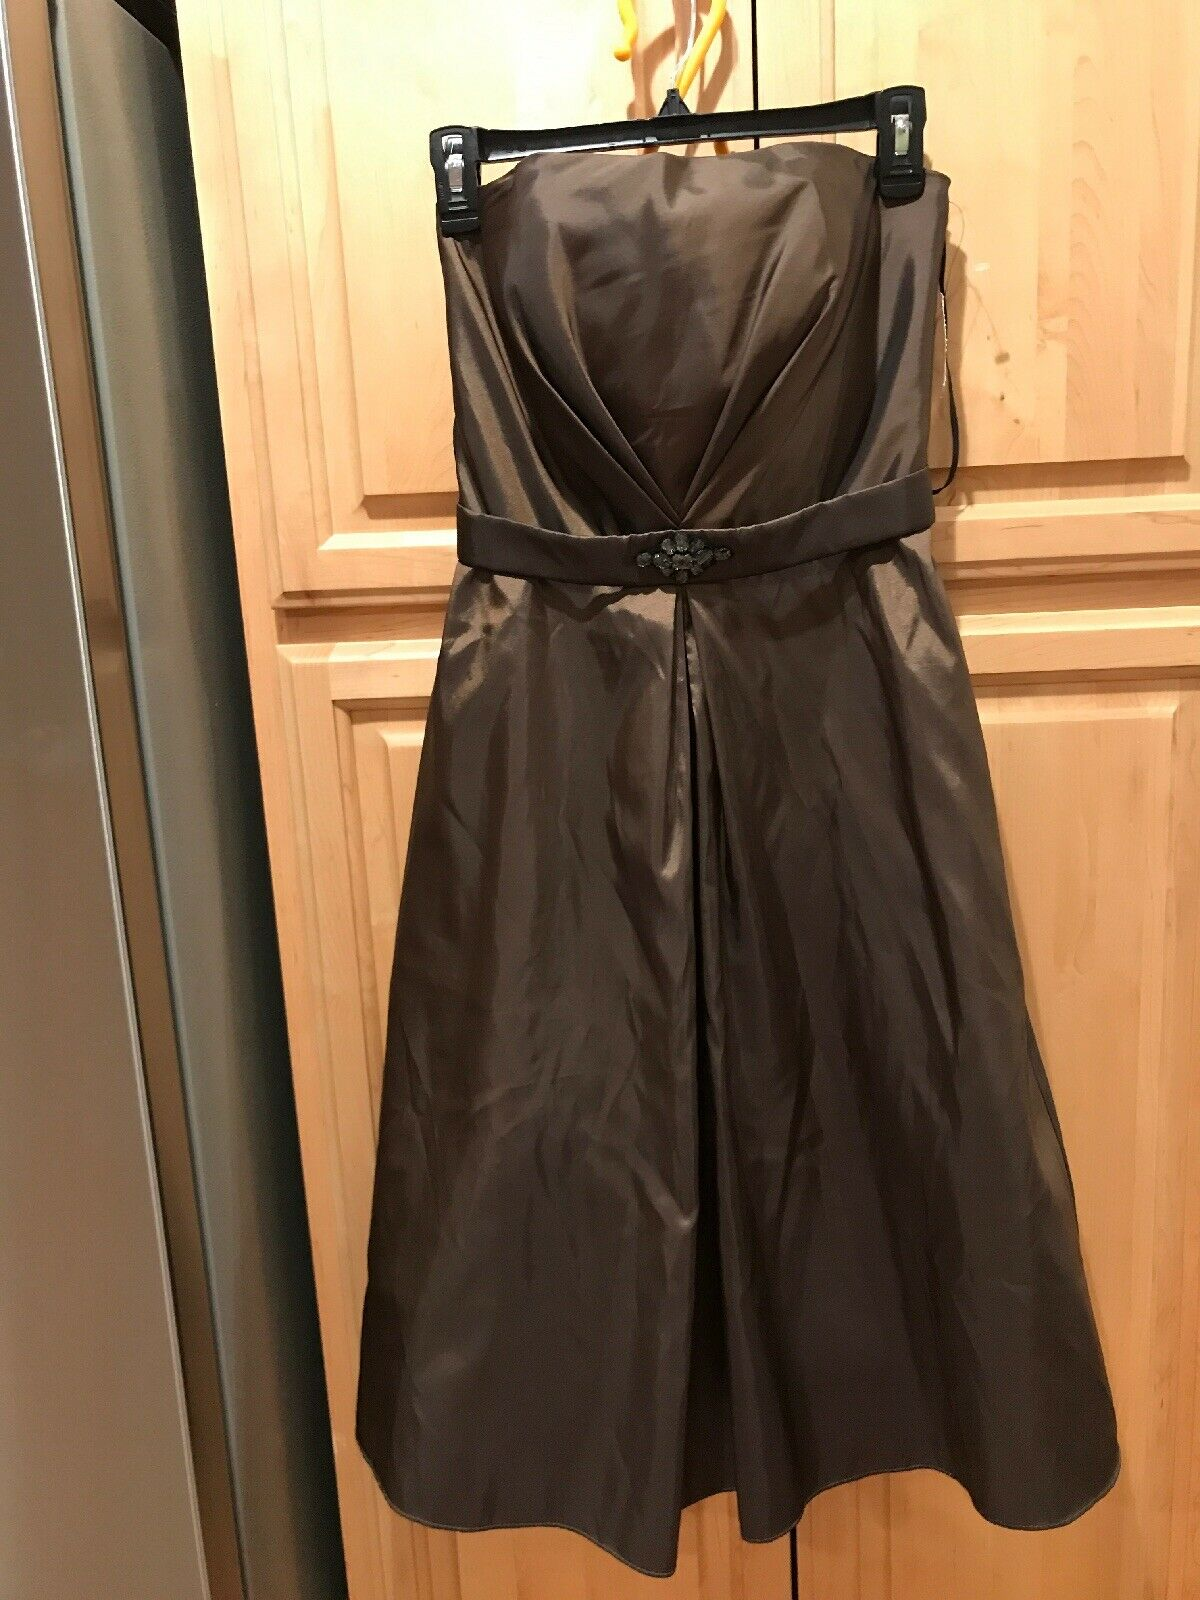 Bari Jay Evening gown bridesmaid Brown sleeveless dress siz S Full Lining #220